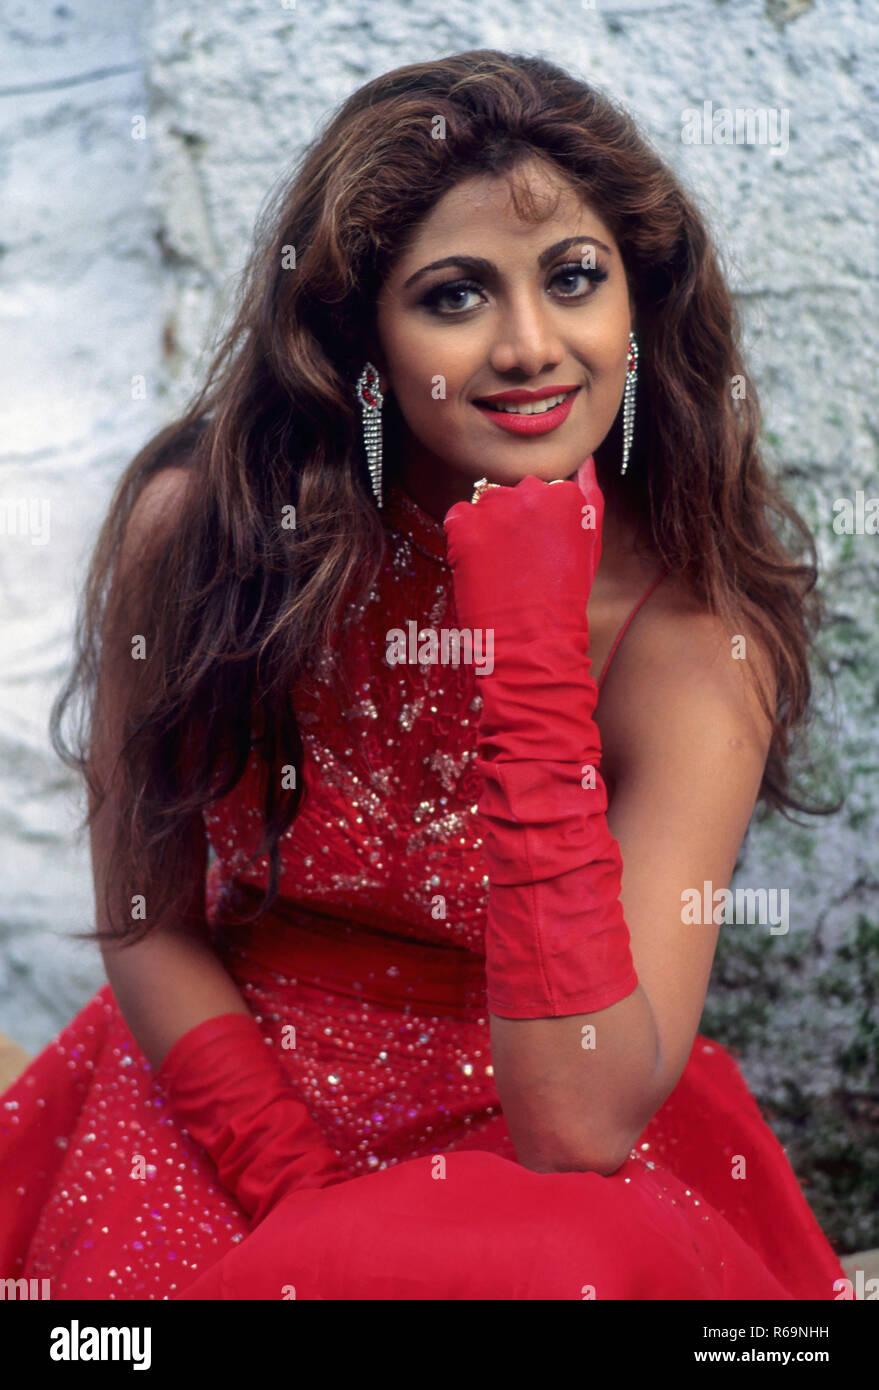 Shilpa Shetty Stock Photos & Shilpa Shetty Stock Images - Alamy